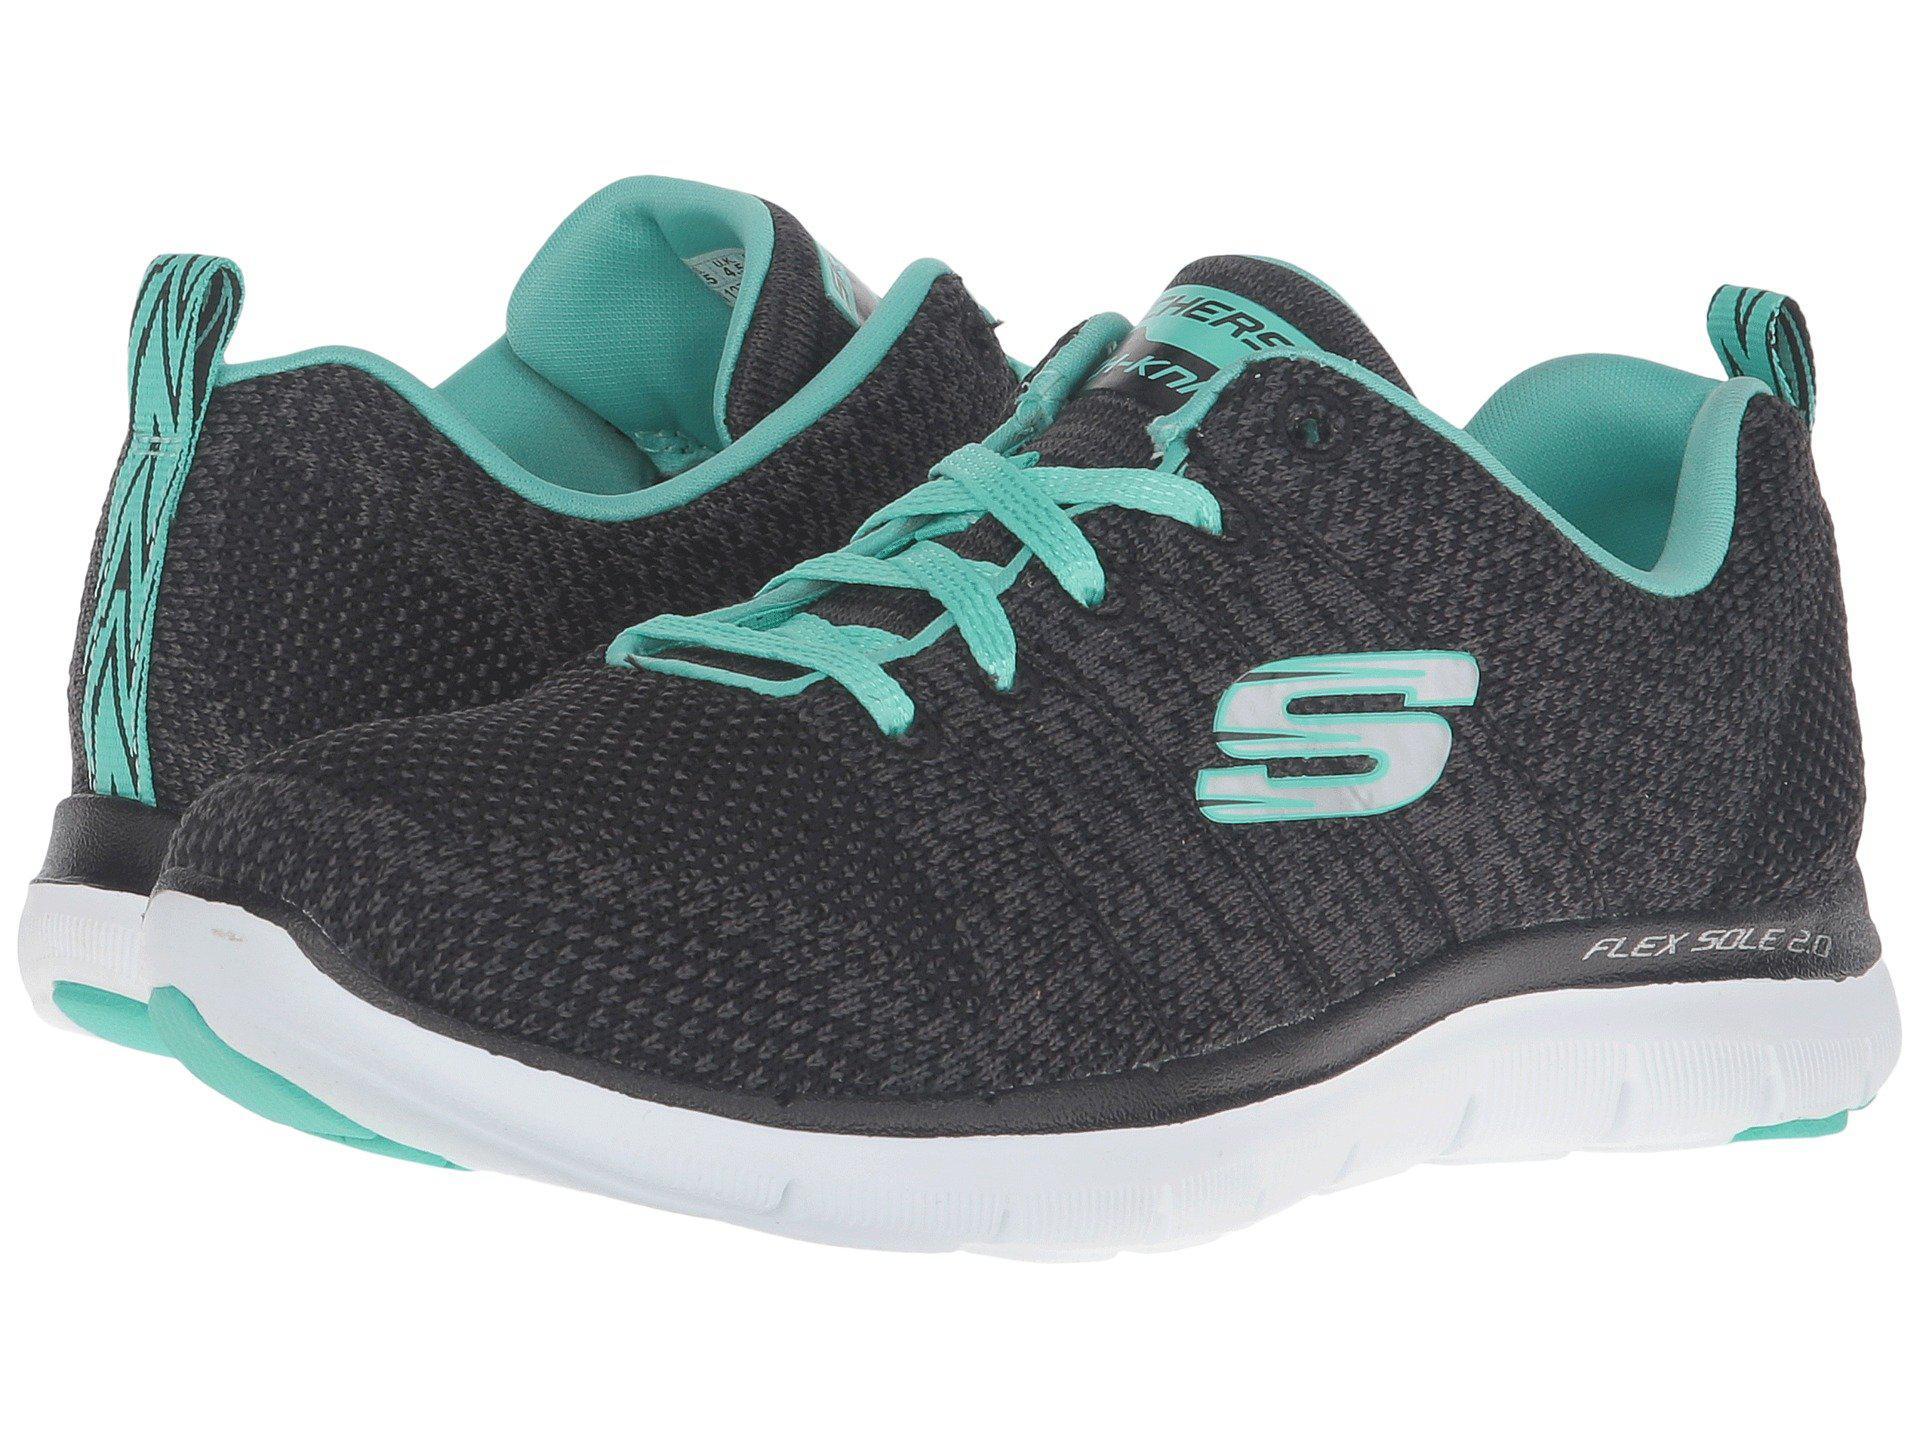 4abf4d5baabe Lyst - Skechers Flex Appeal 2.0 - High Energy (black aqua) Women s Shoes